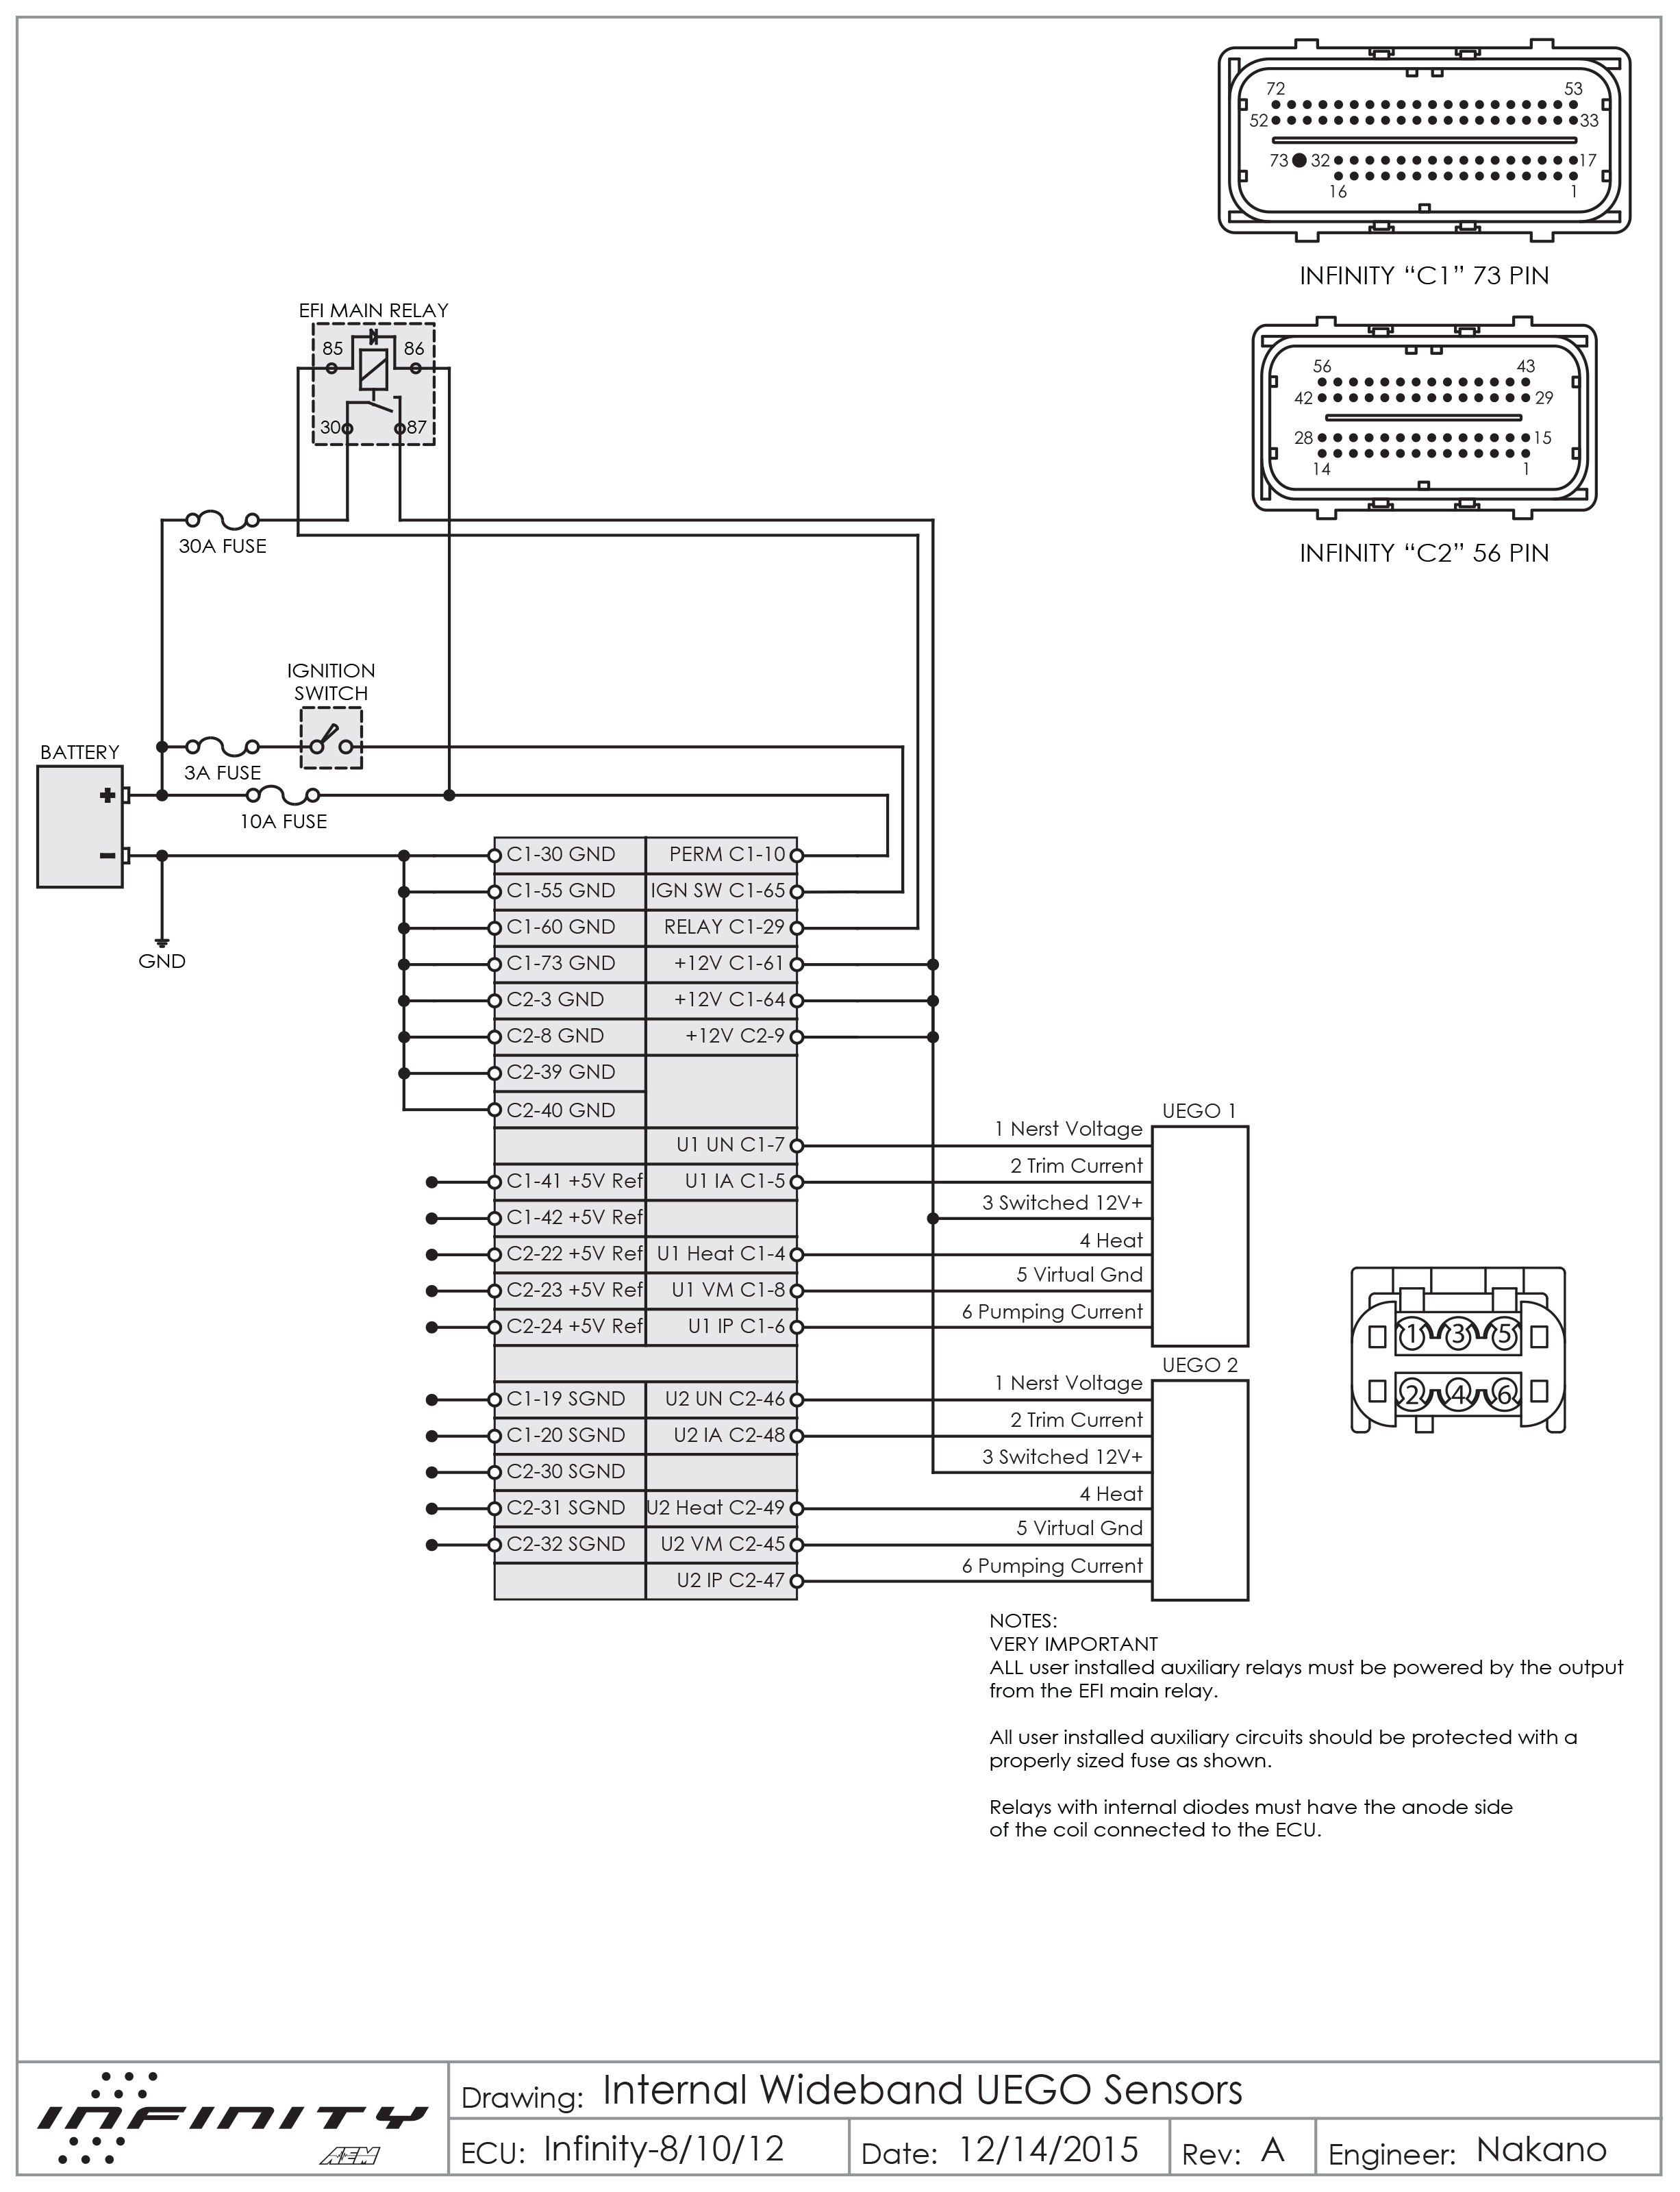 Bosch 4.2 Wiring/pinout   Aem - Aem Wideband Wiring Diagram